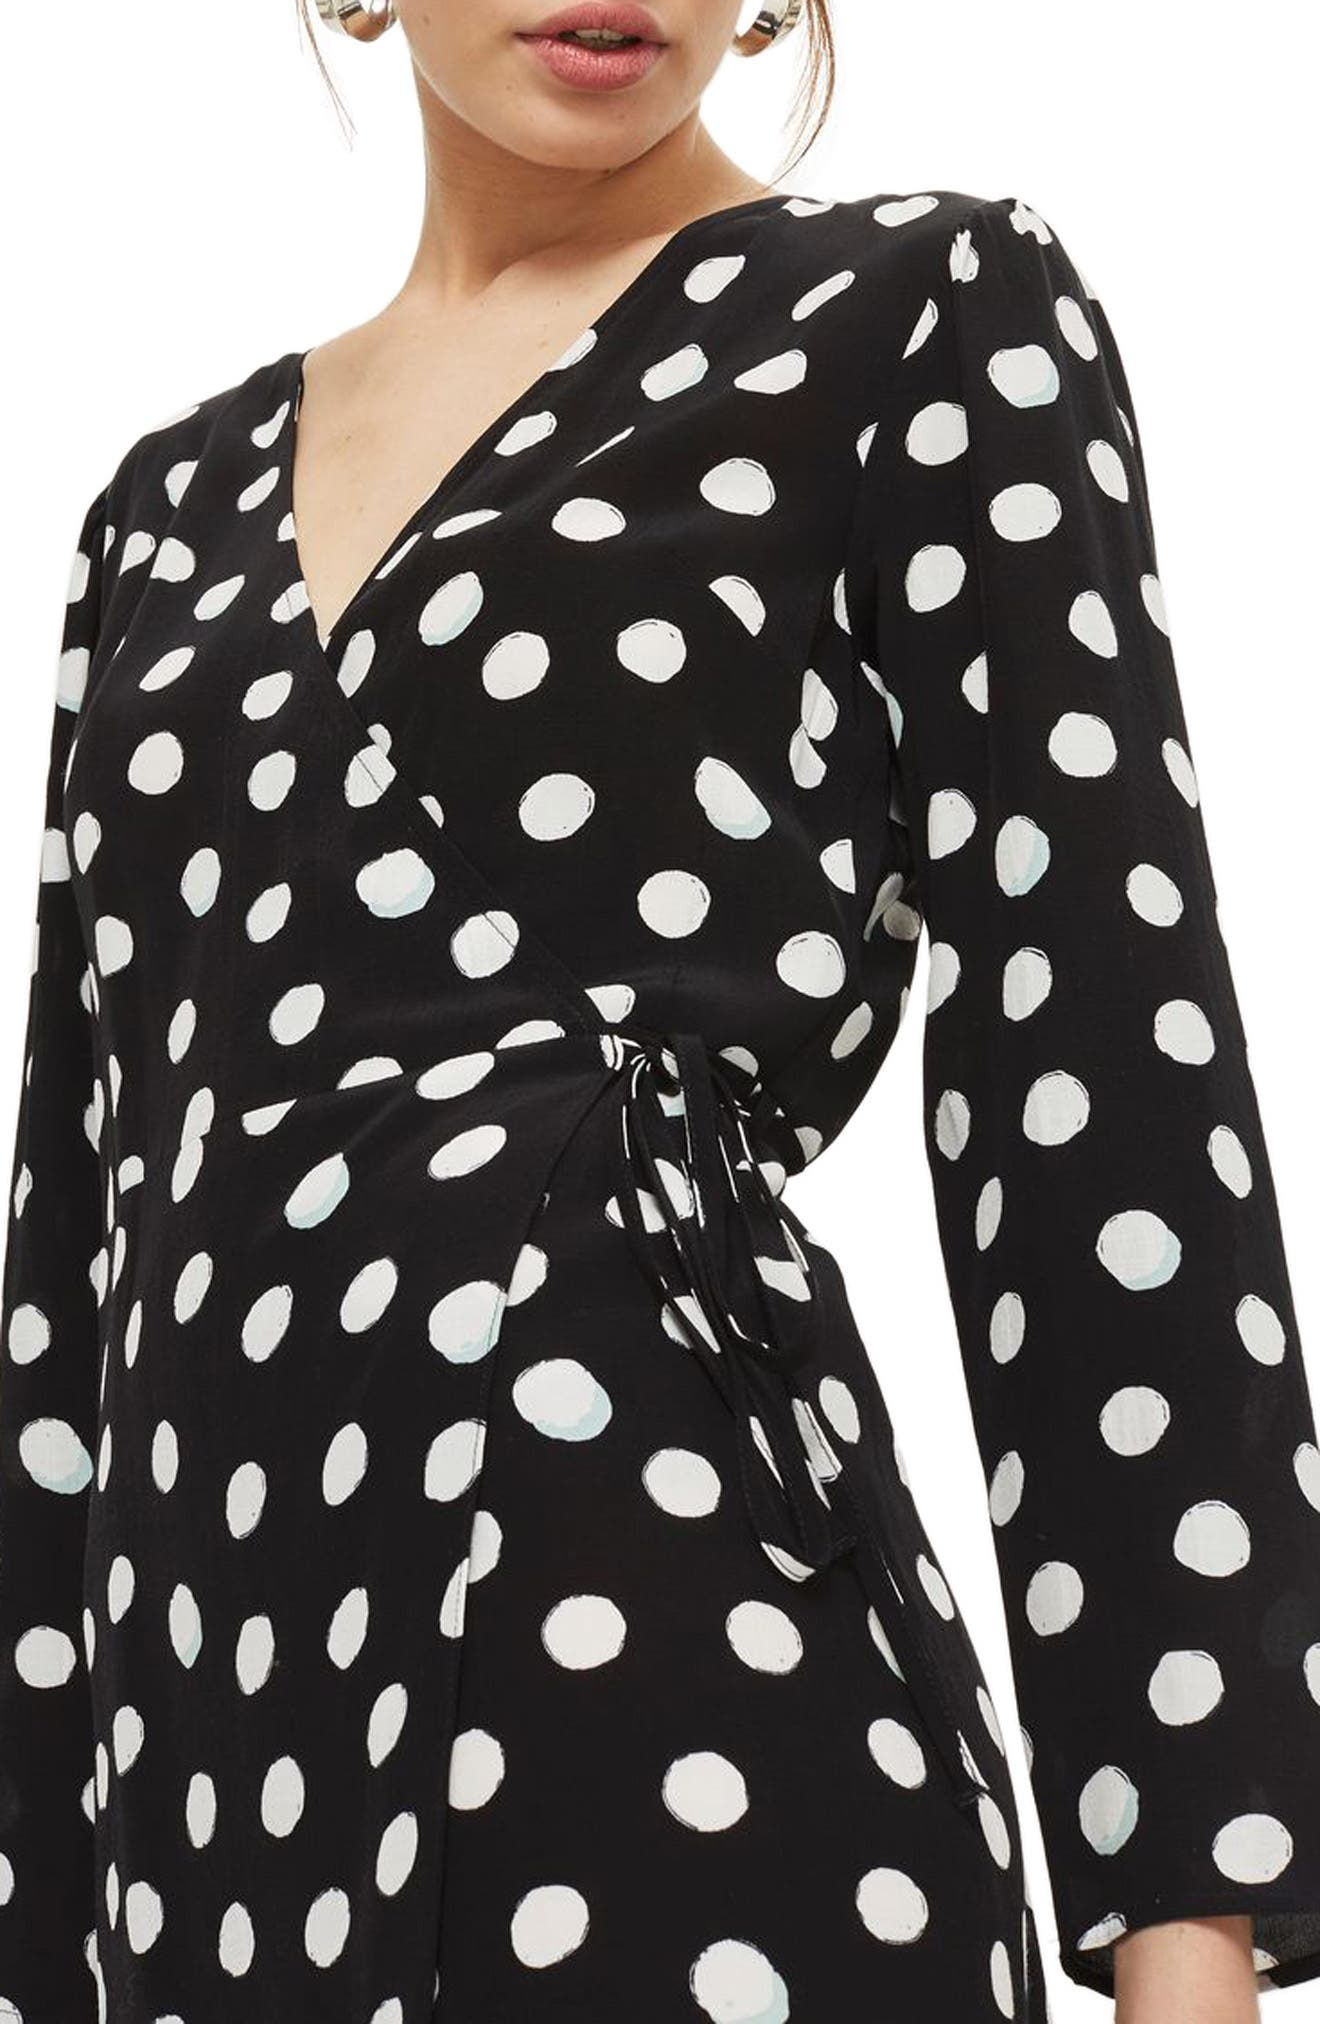 Polka Dot Wrap Dress,                         Main,                         color, Black Multi